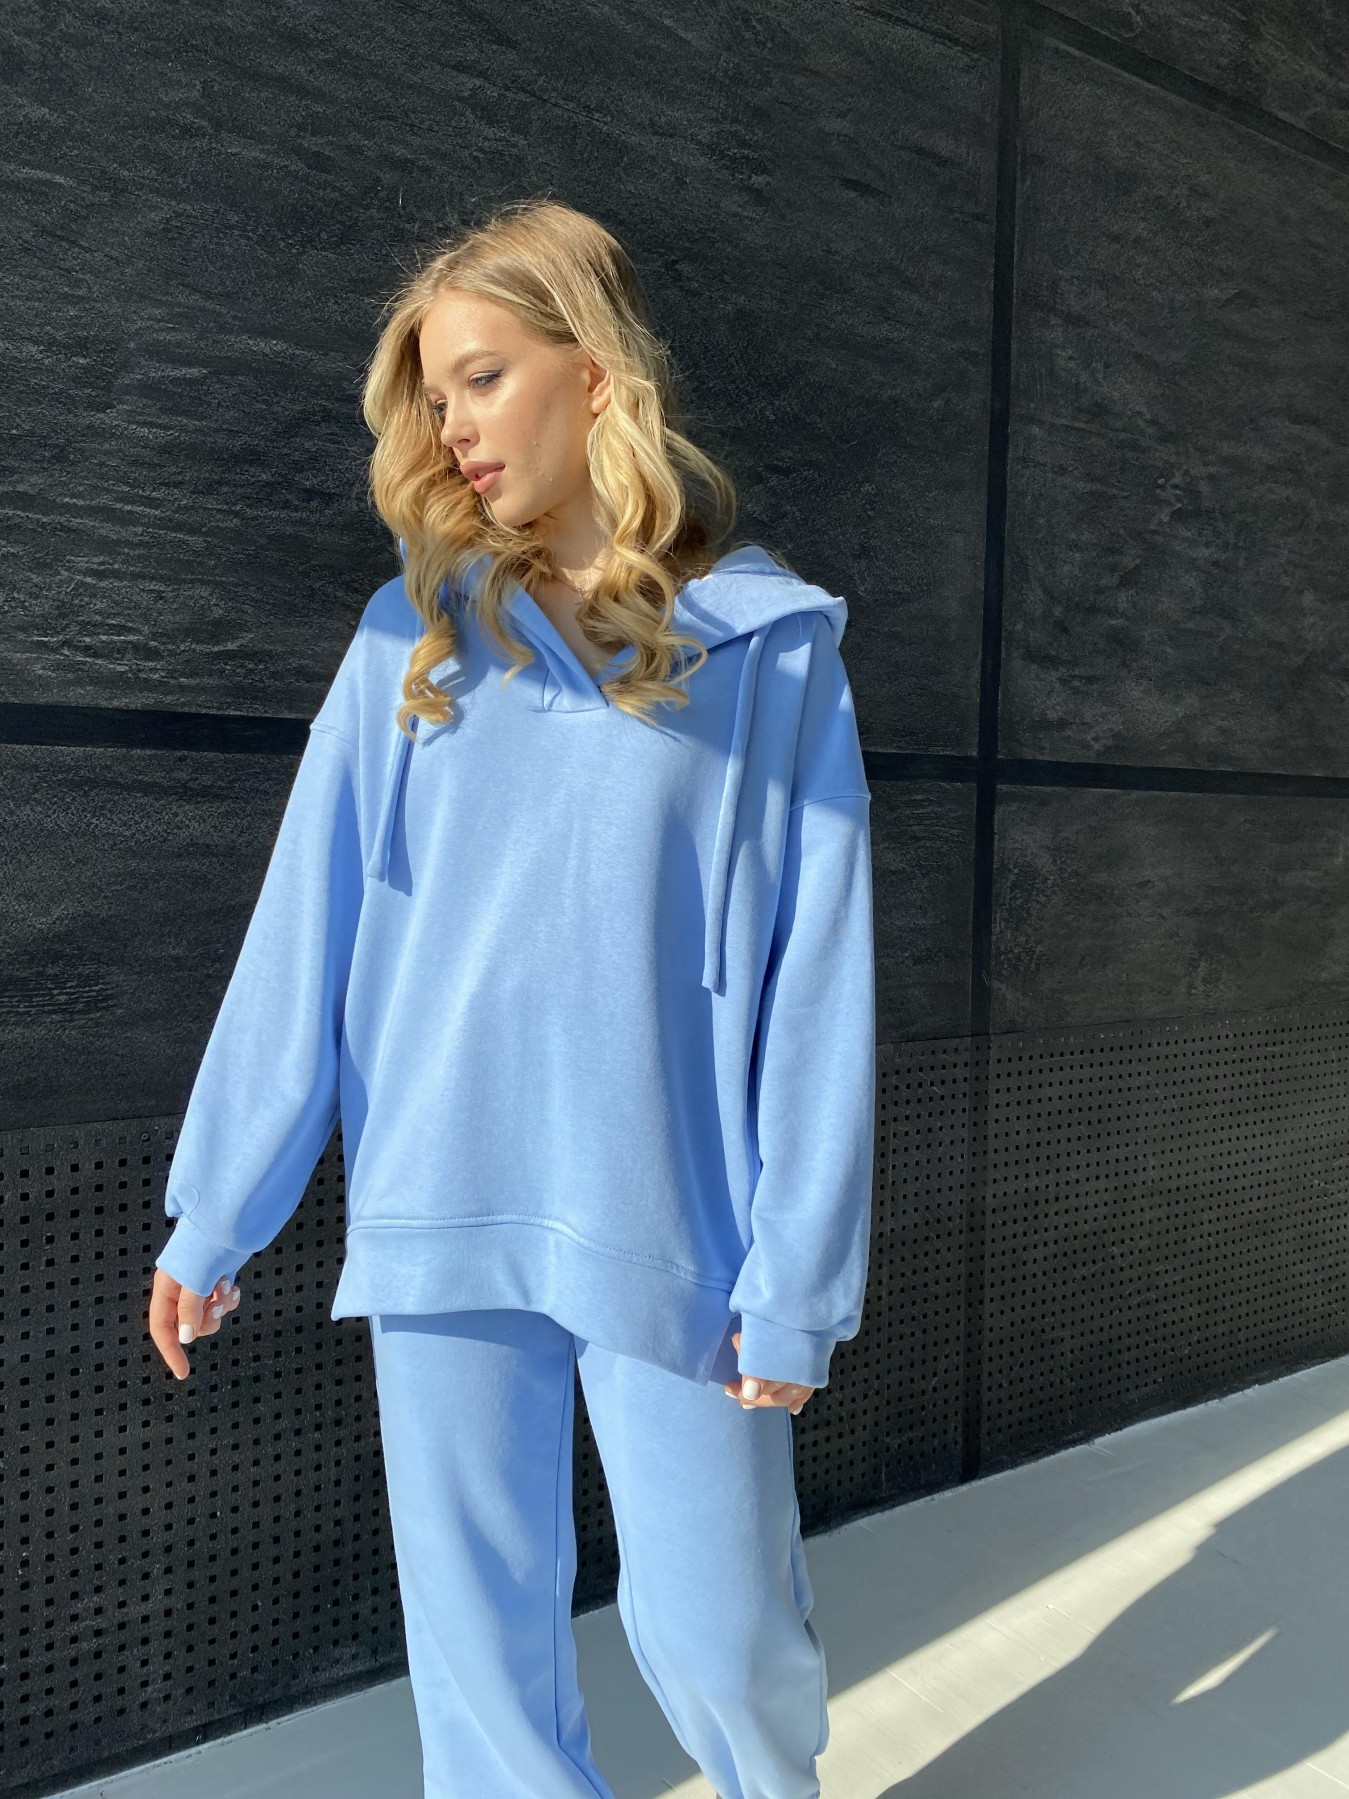 Ярис костюм из 3х нитки 10789 АРТ. 47260 Цвет: Голубой - фото 6, интернет магазин tm-modus.ru